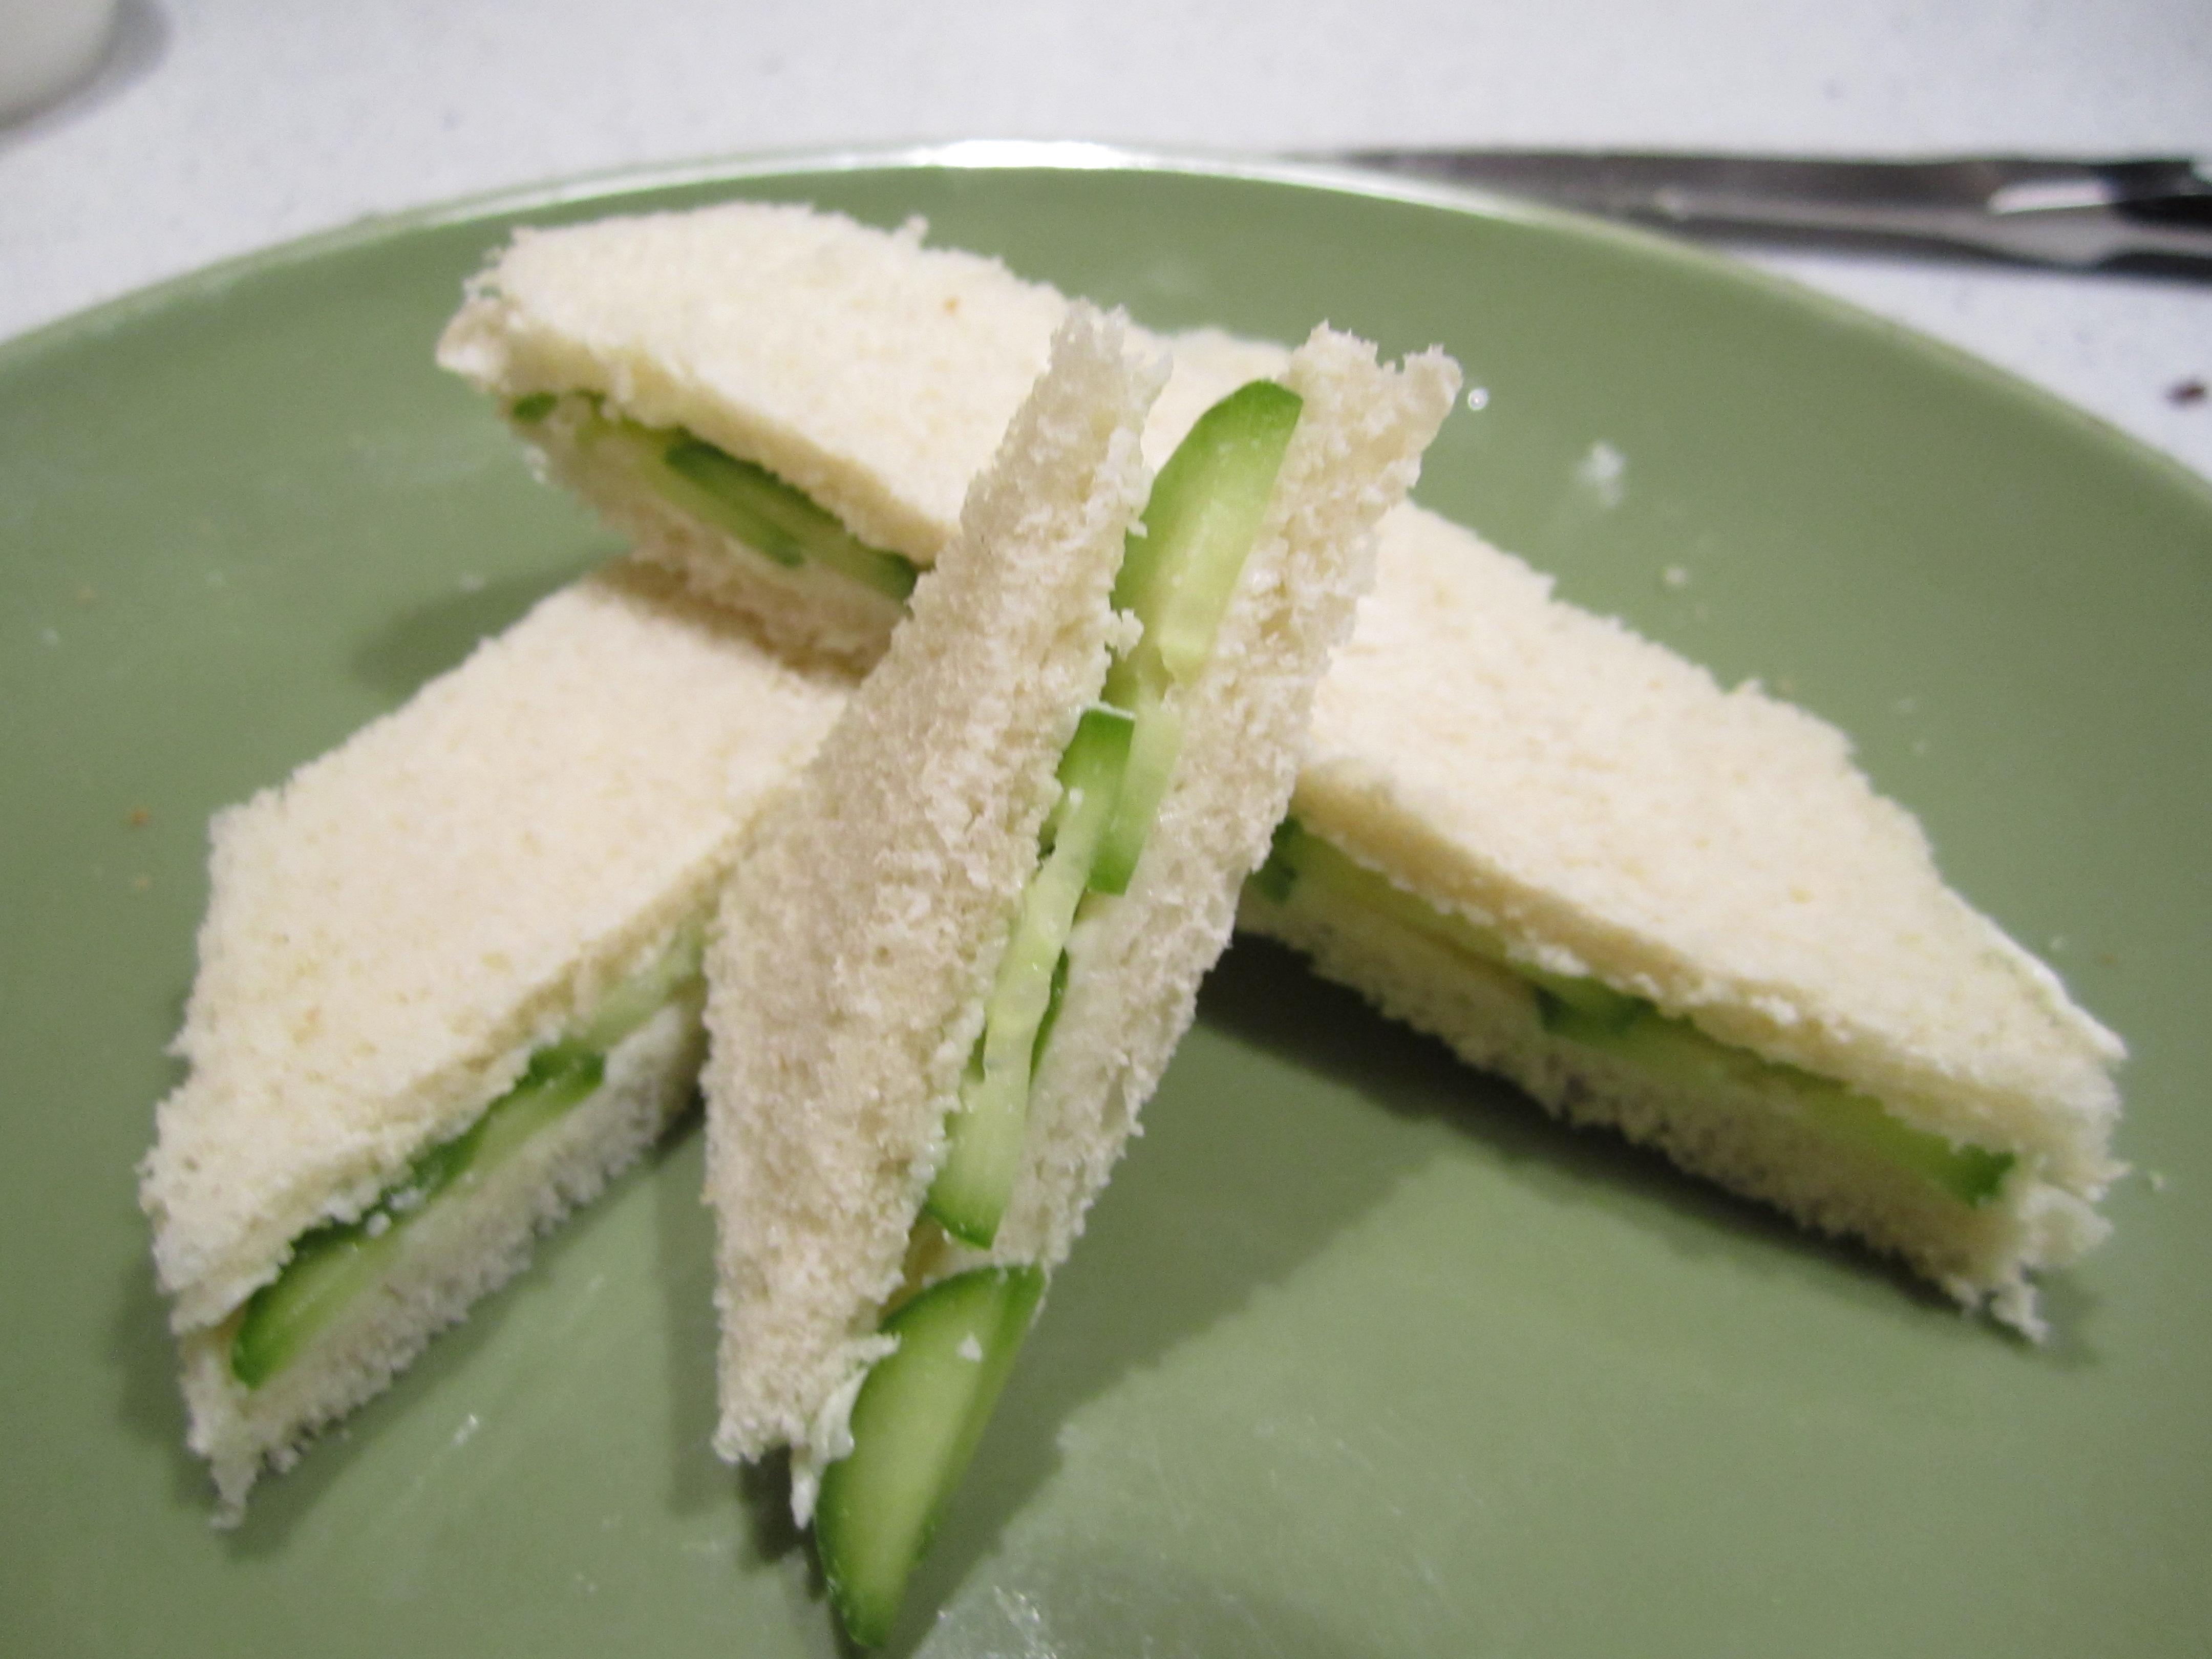 Cucumber Sandwiches – BakingMeHungry